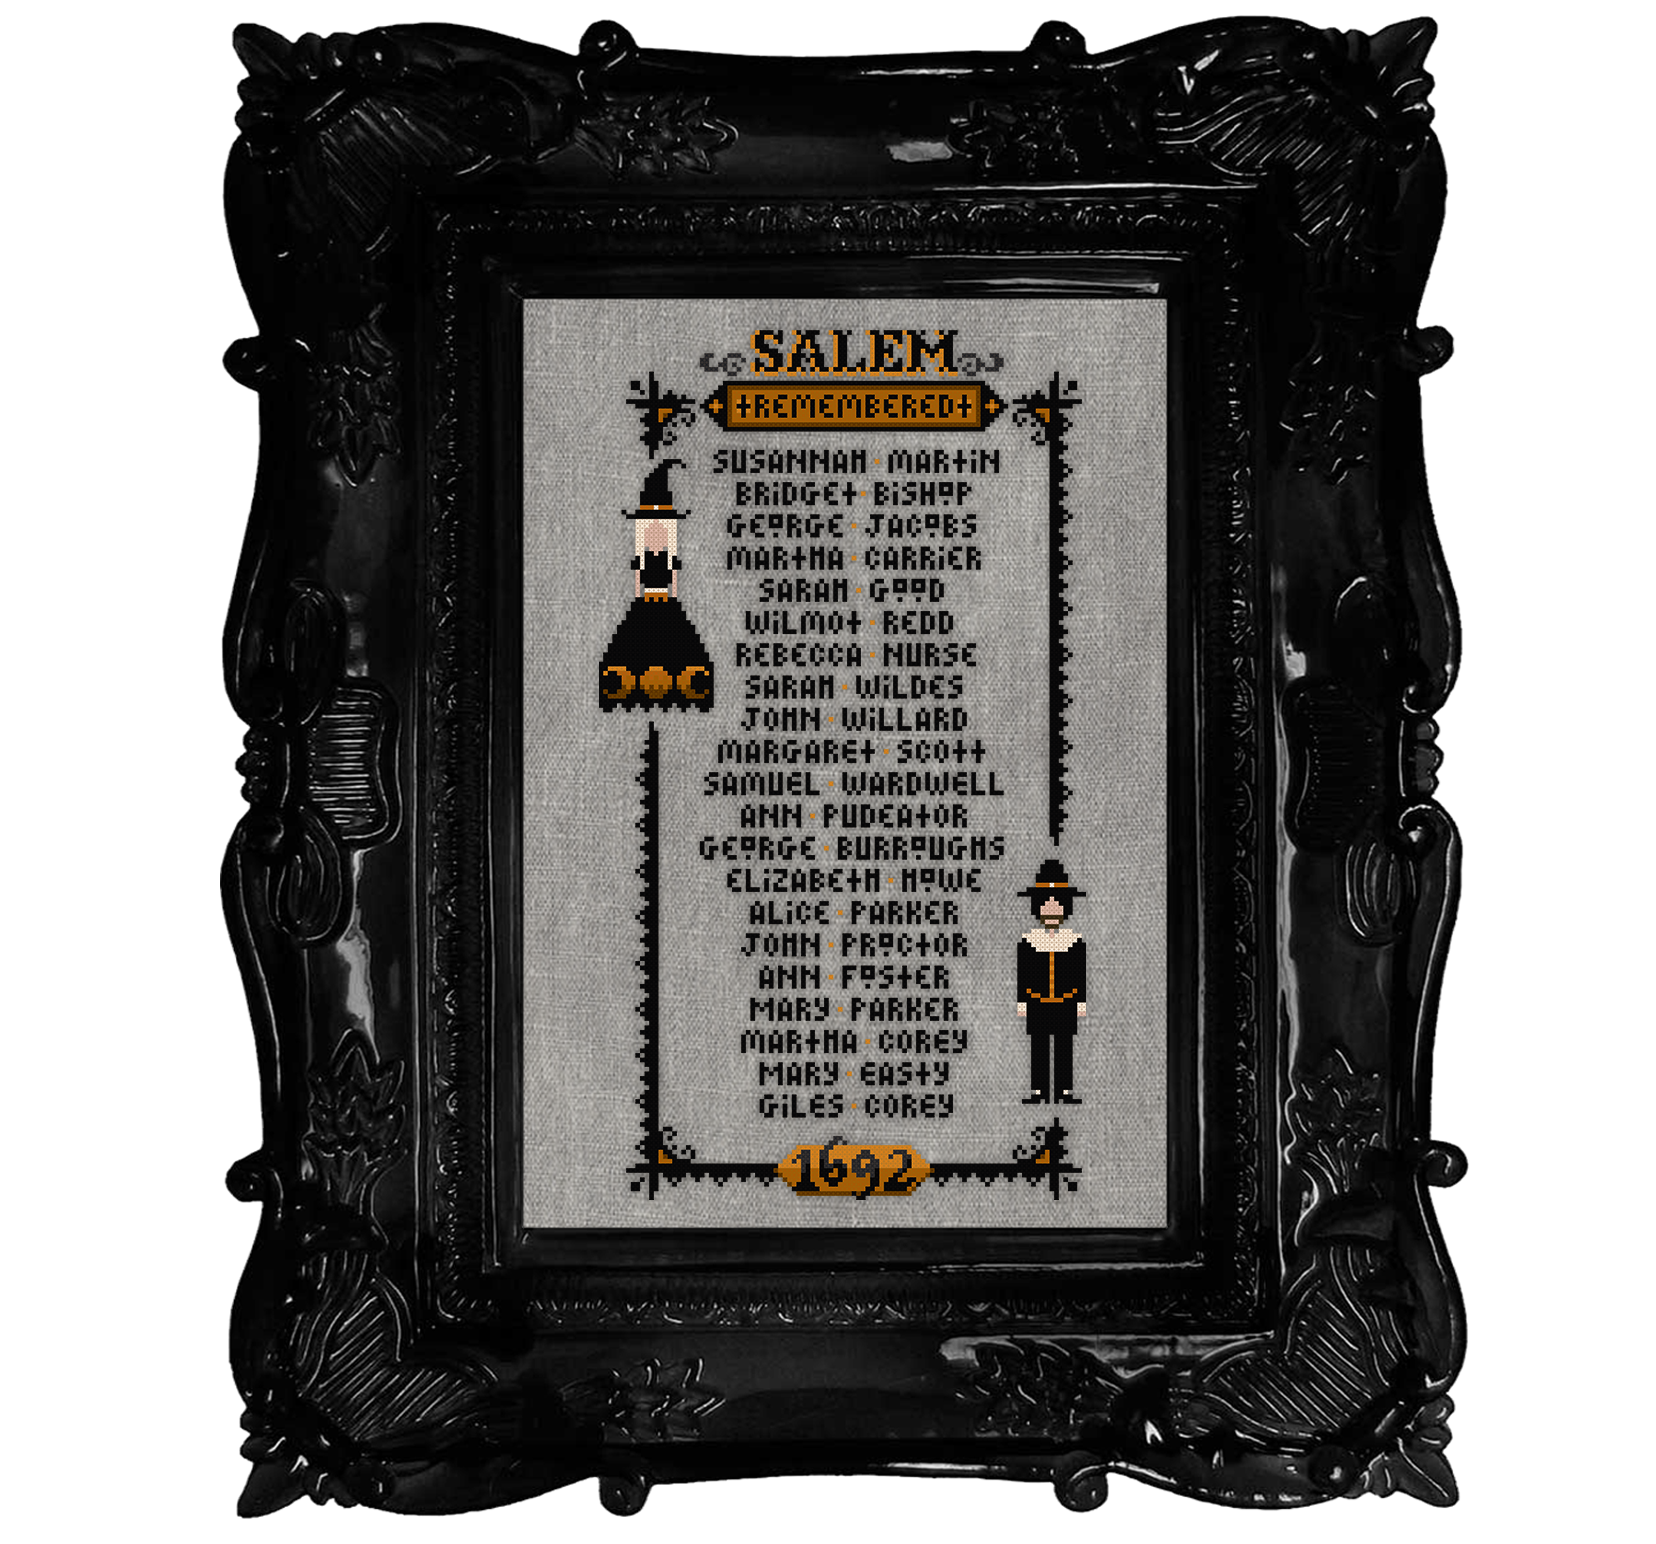 Salem Remembered